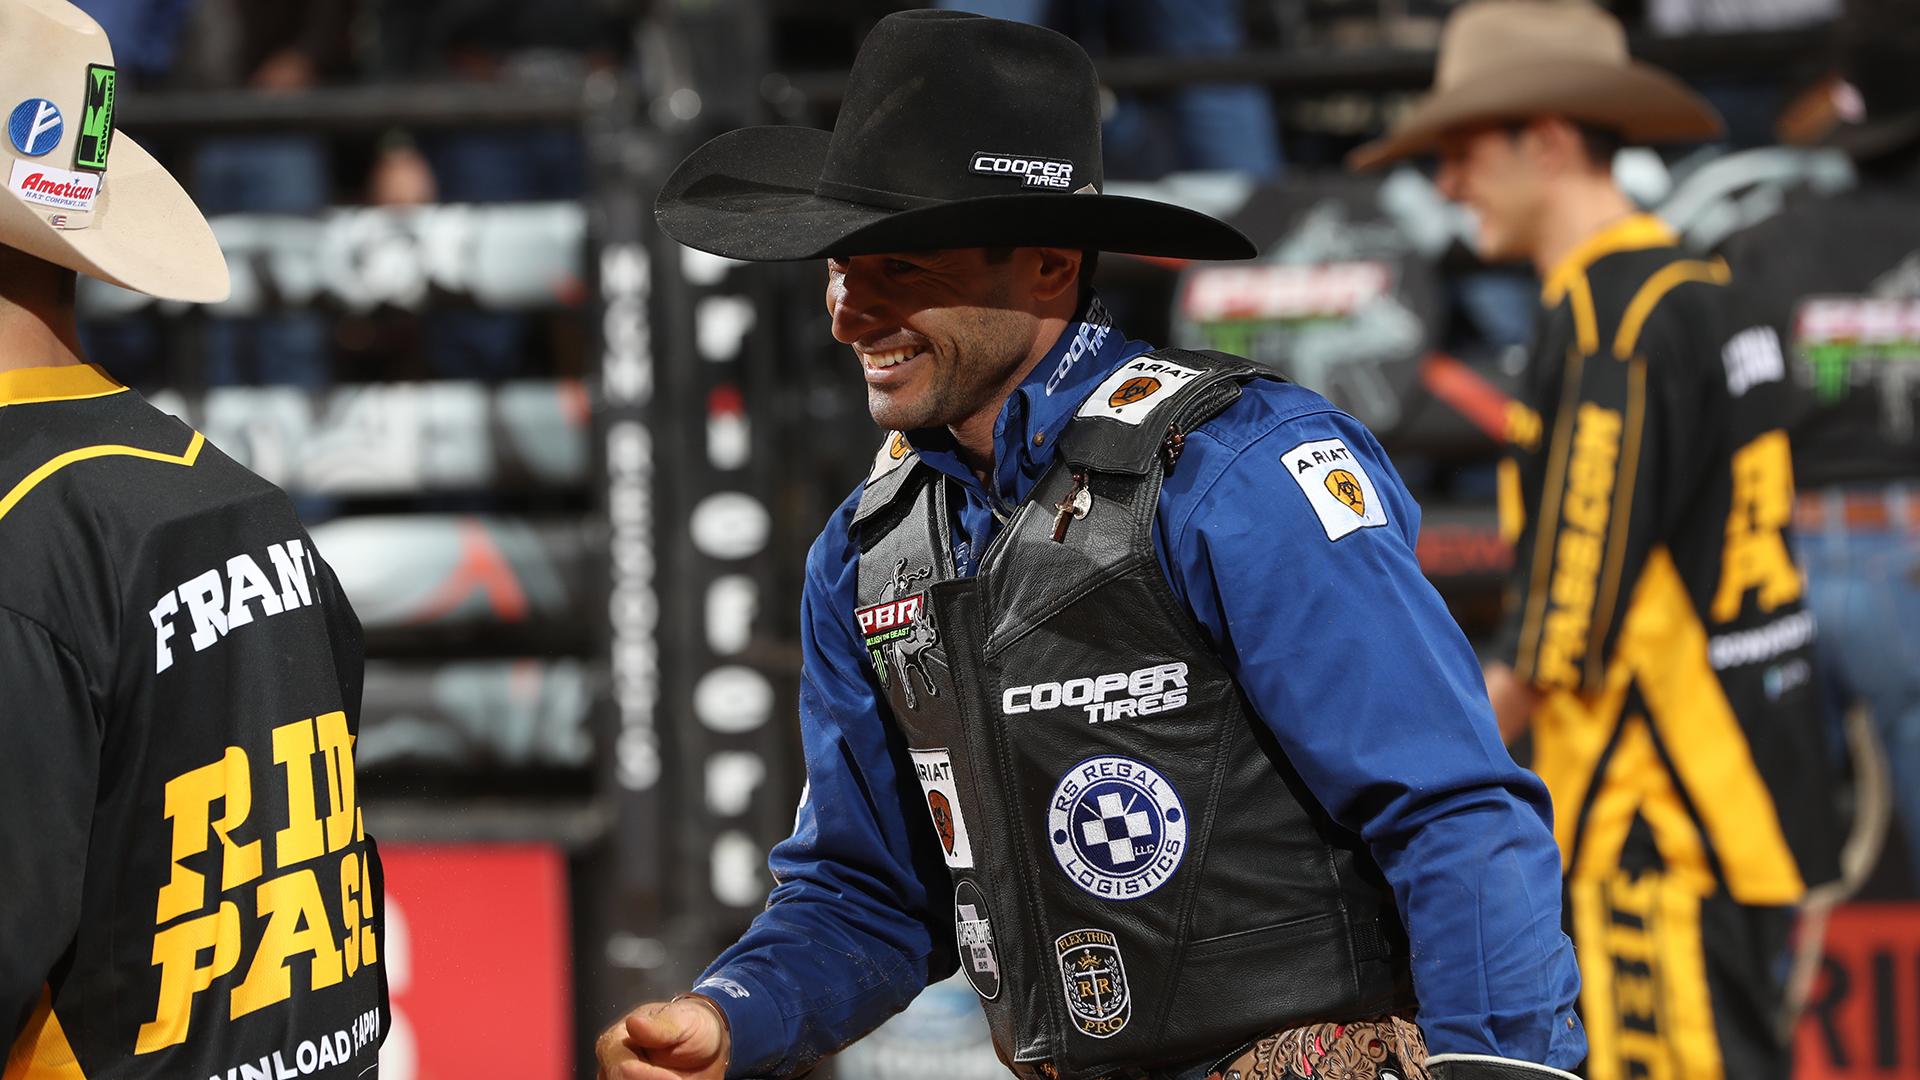 Vieira wins THE AMERICAN bull riding and piece of $1 million bonus